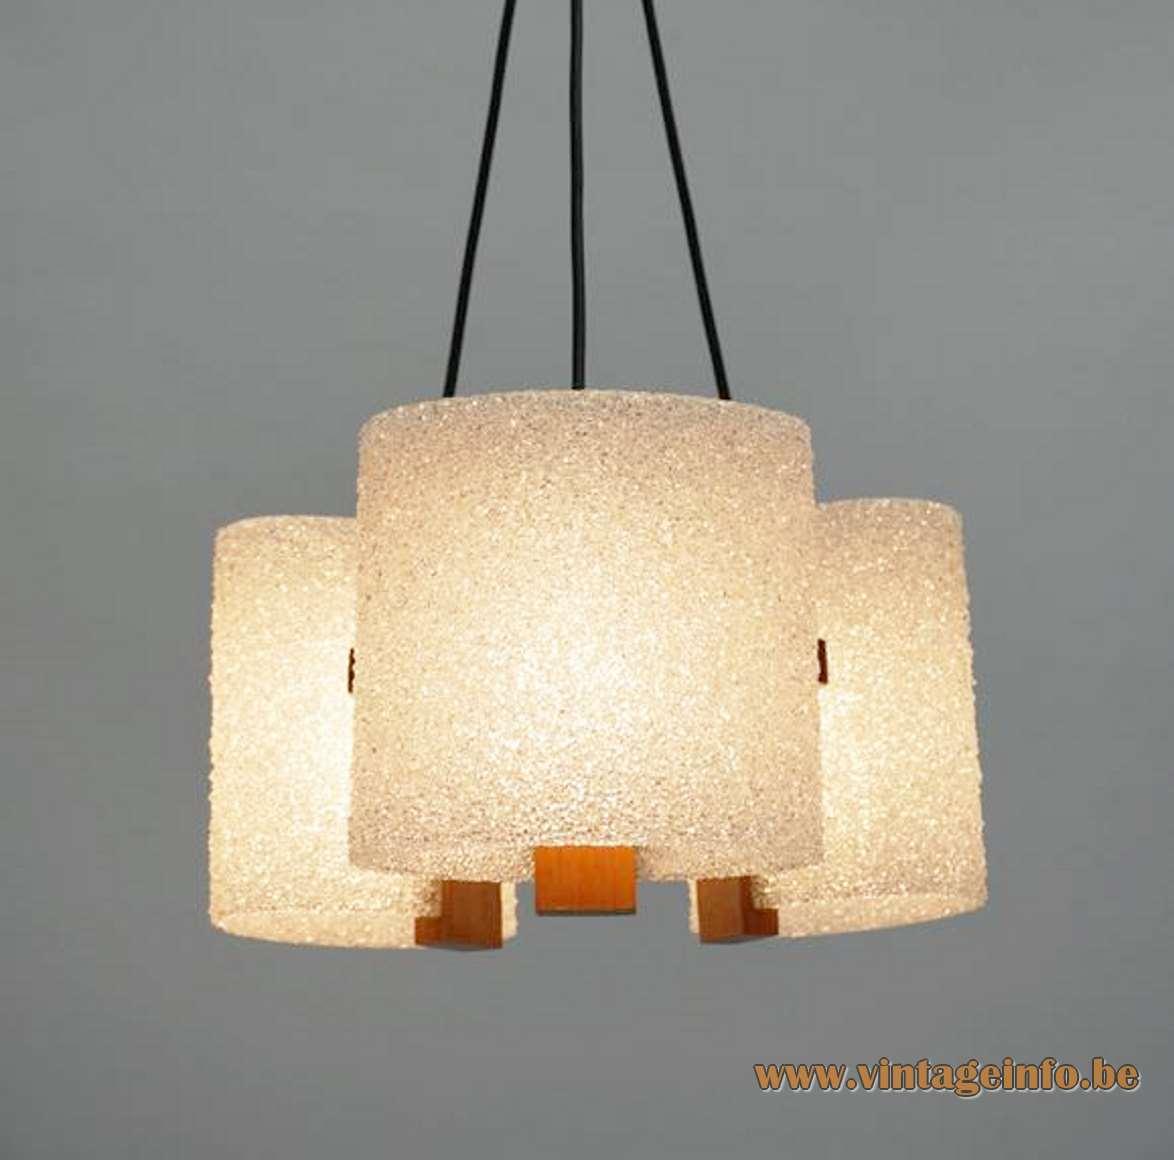 1960s acrylic & teak chandelier pressed grains teak wood Maison Arlus France 1970s Mid-Century Modern